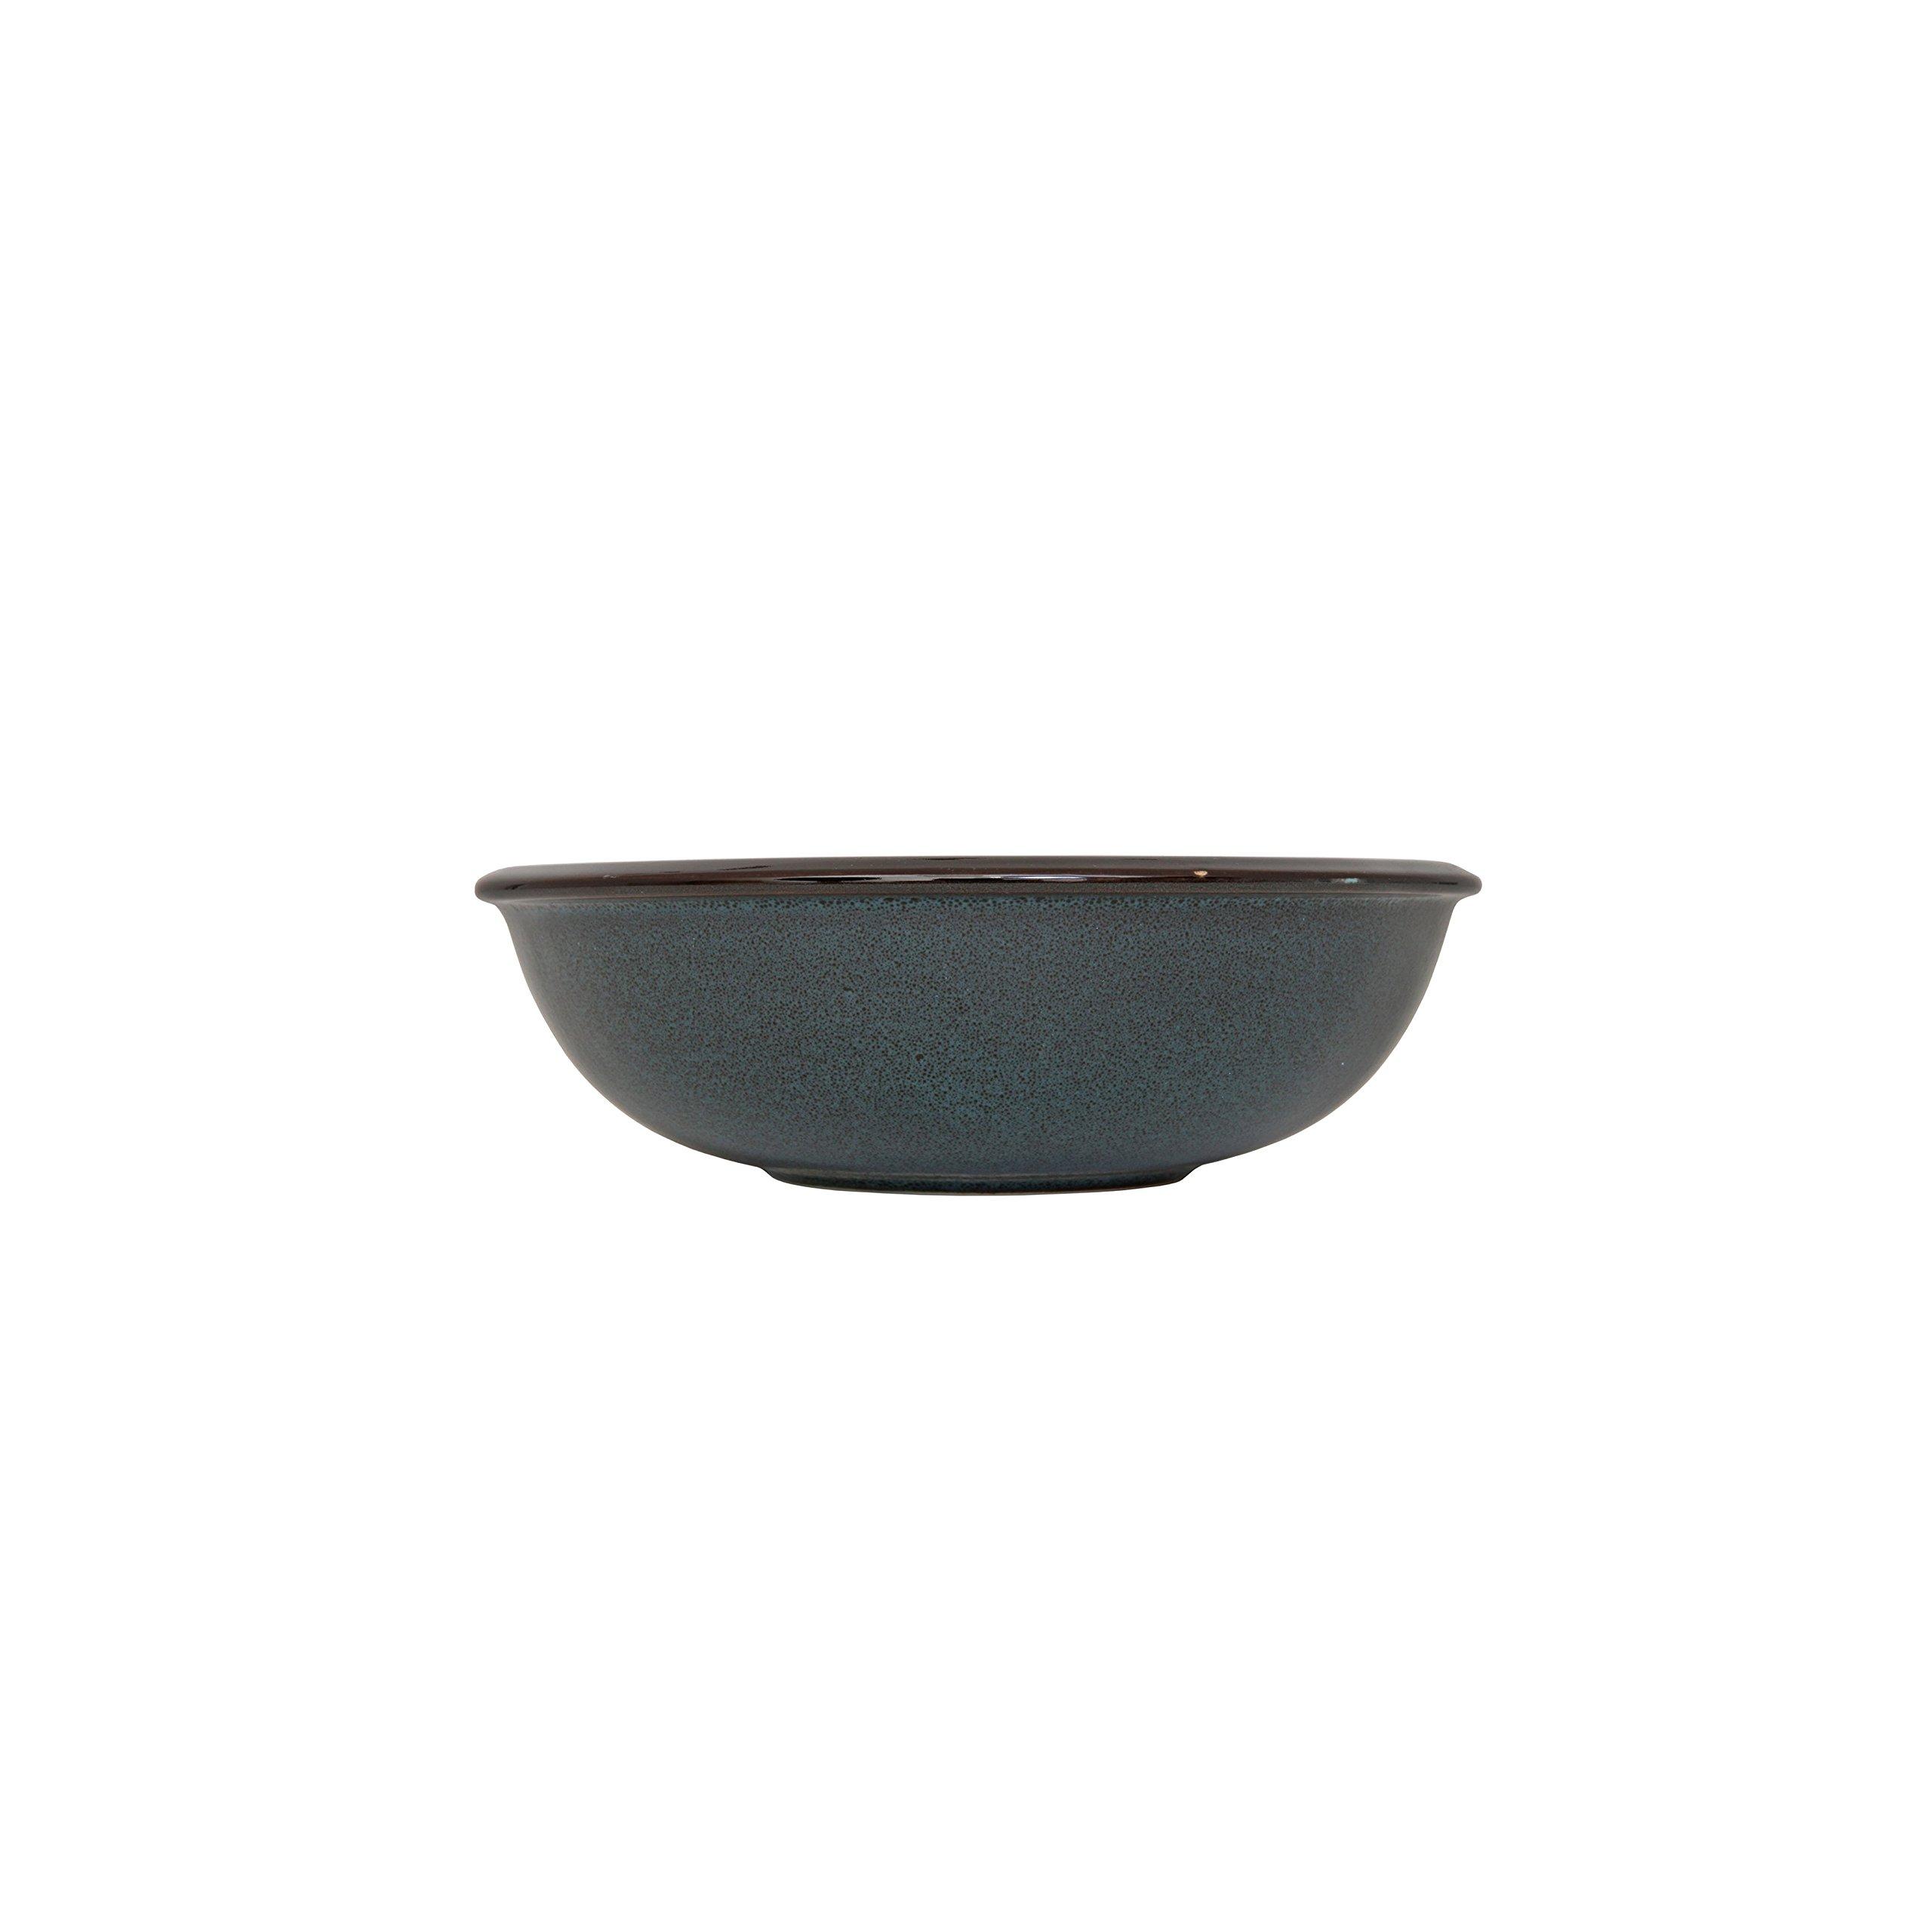 D&V 6 Piece Stōn Porcelain Dinnerware Bowl Set, 7'' x 2.25'', Twilight